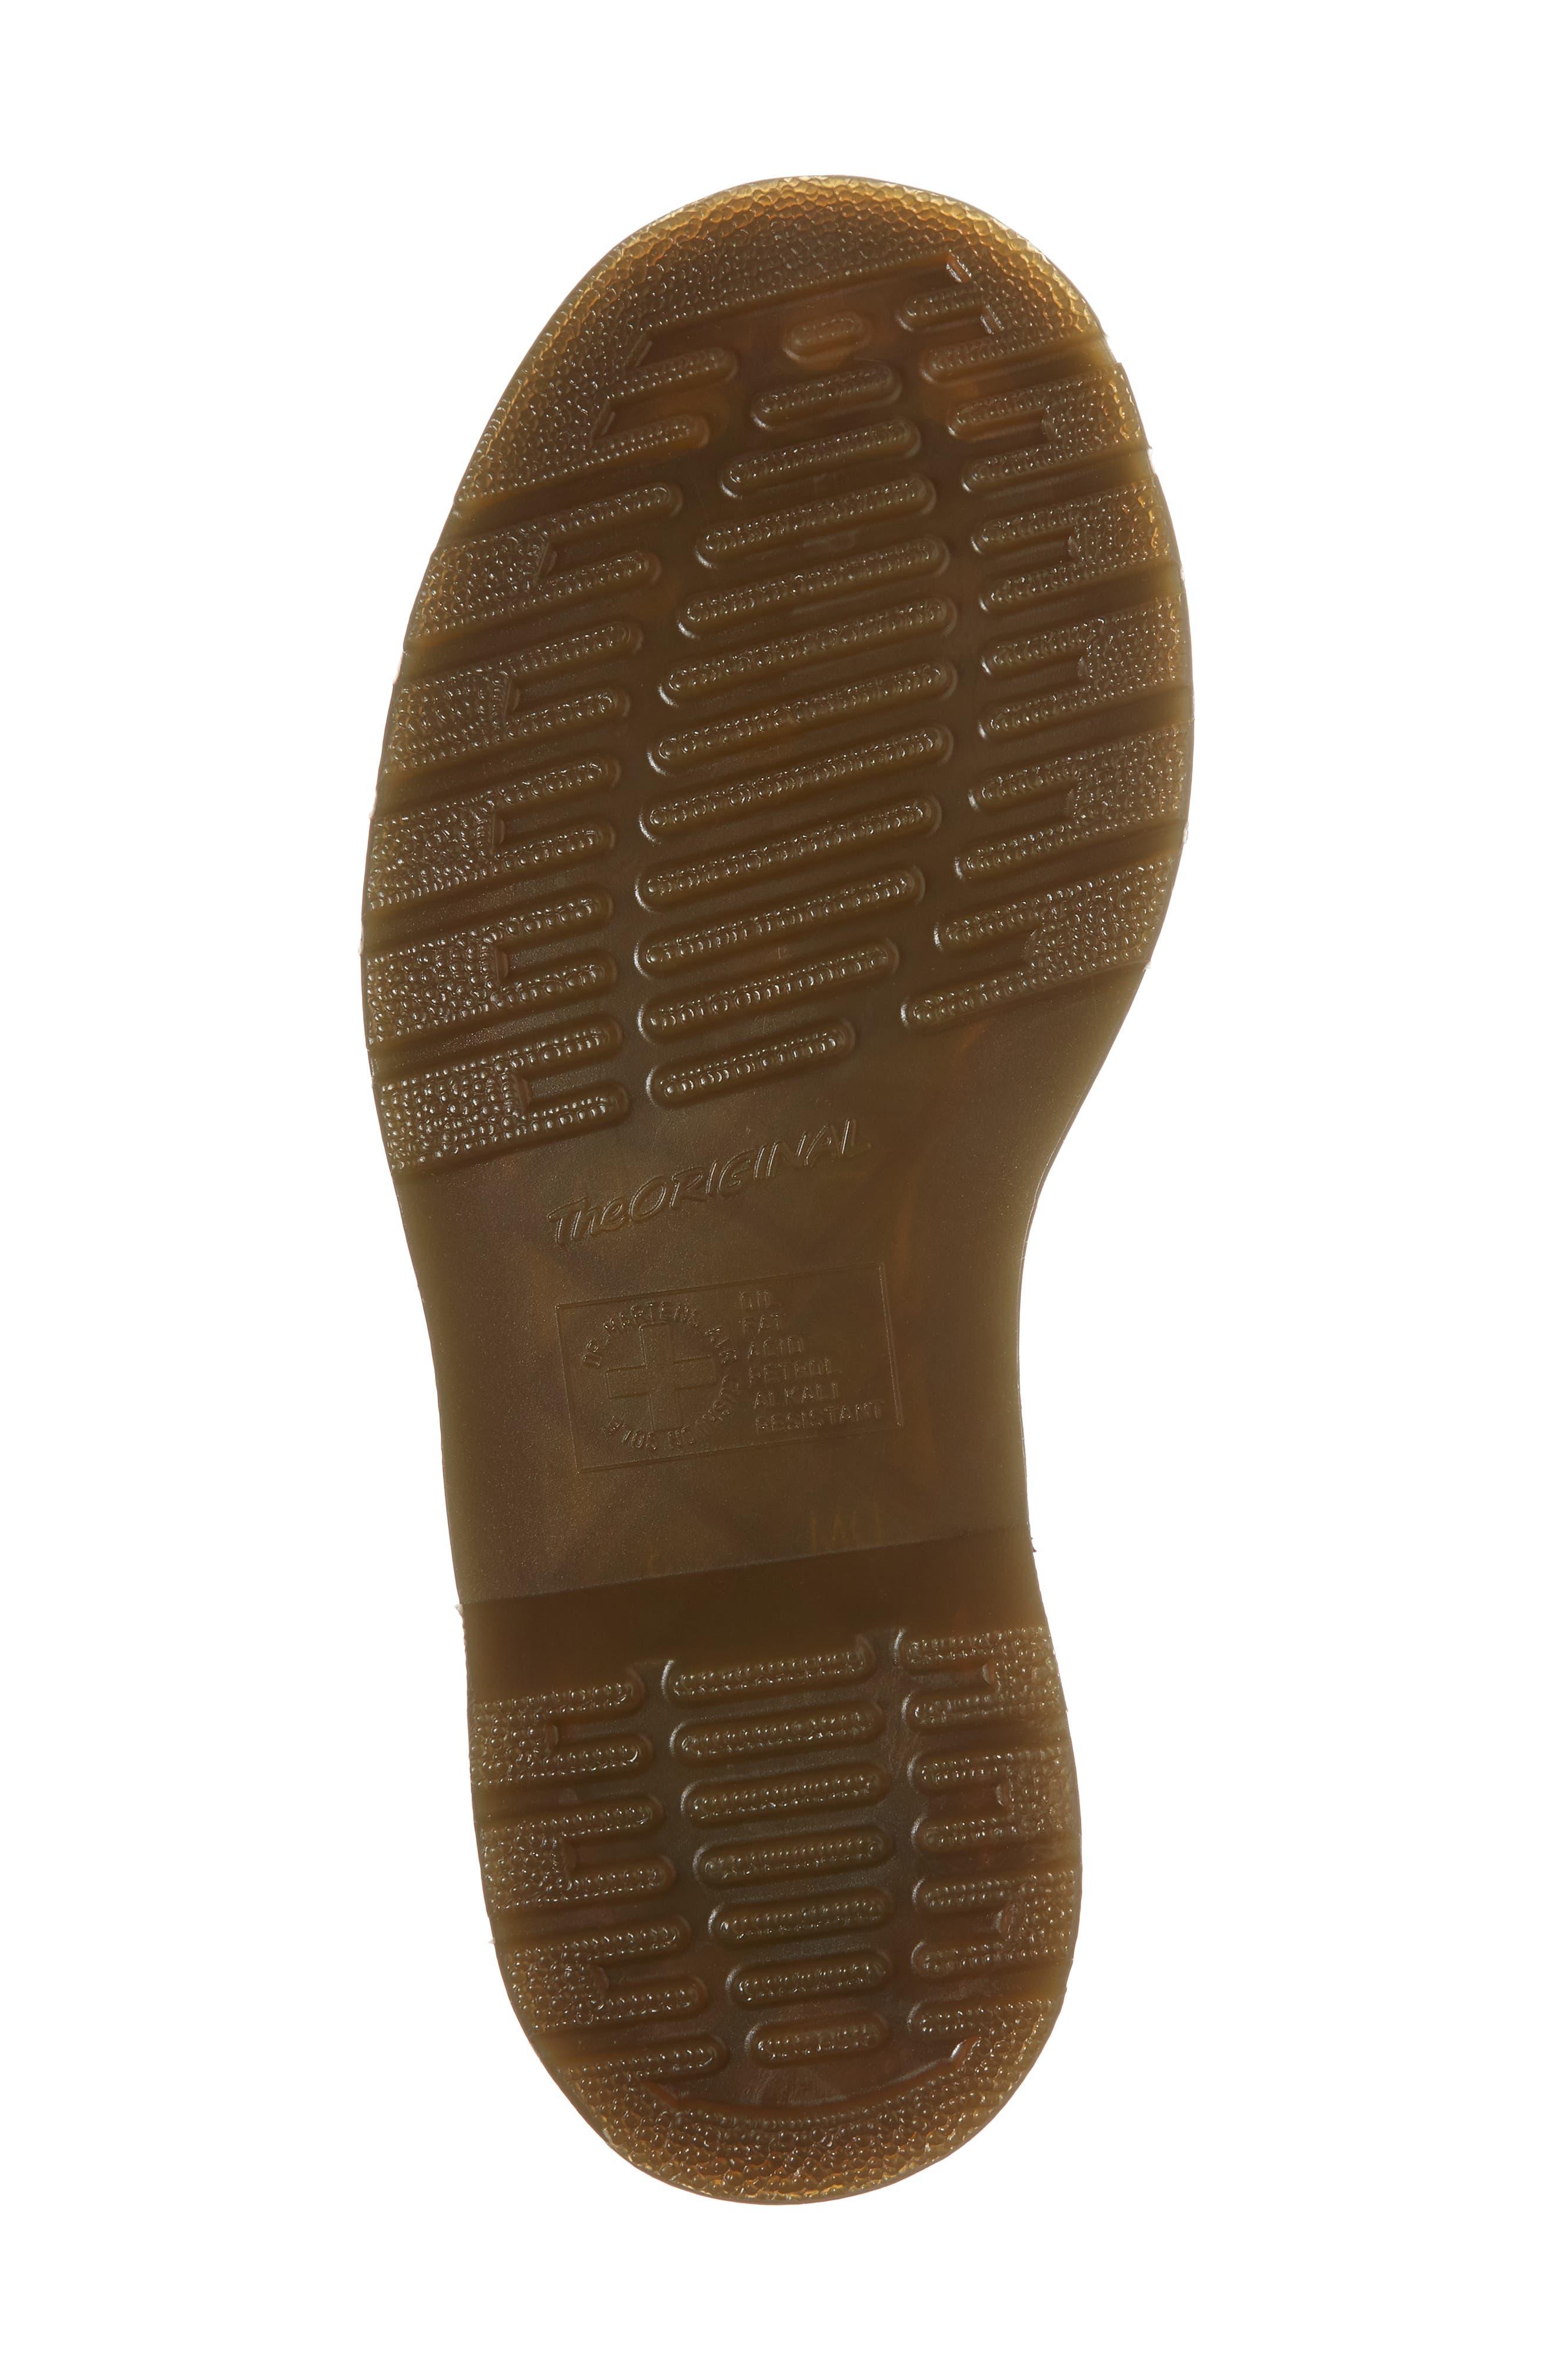 Pascal Wanderlust Boot,                             Alternate thumbnail 6, color,                             Black Floral Leather